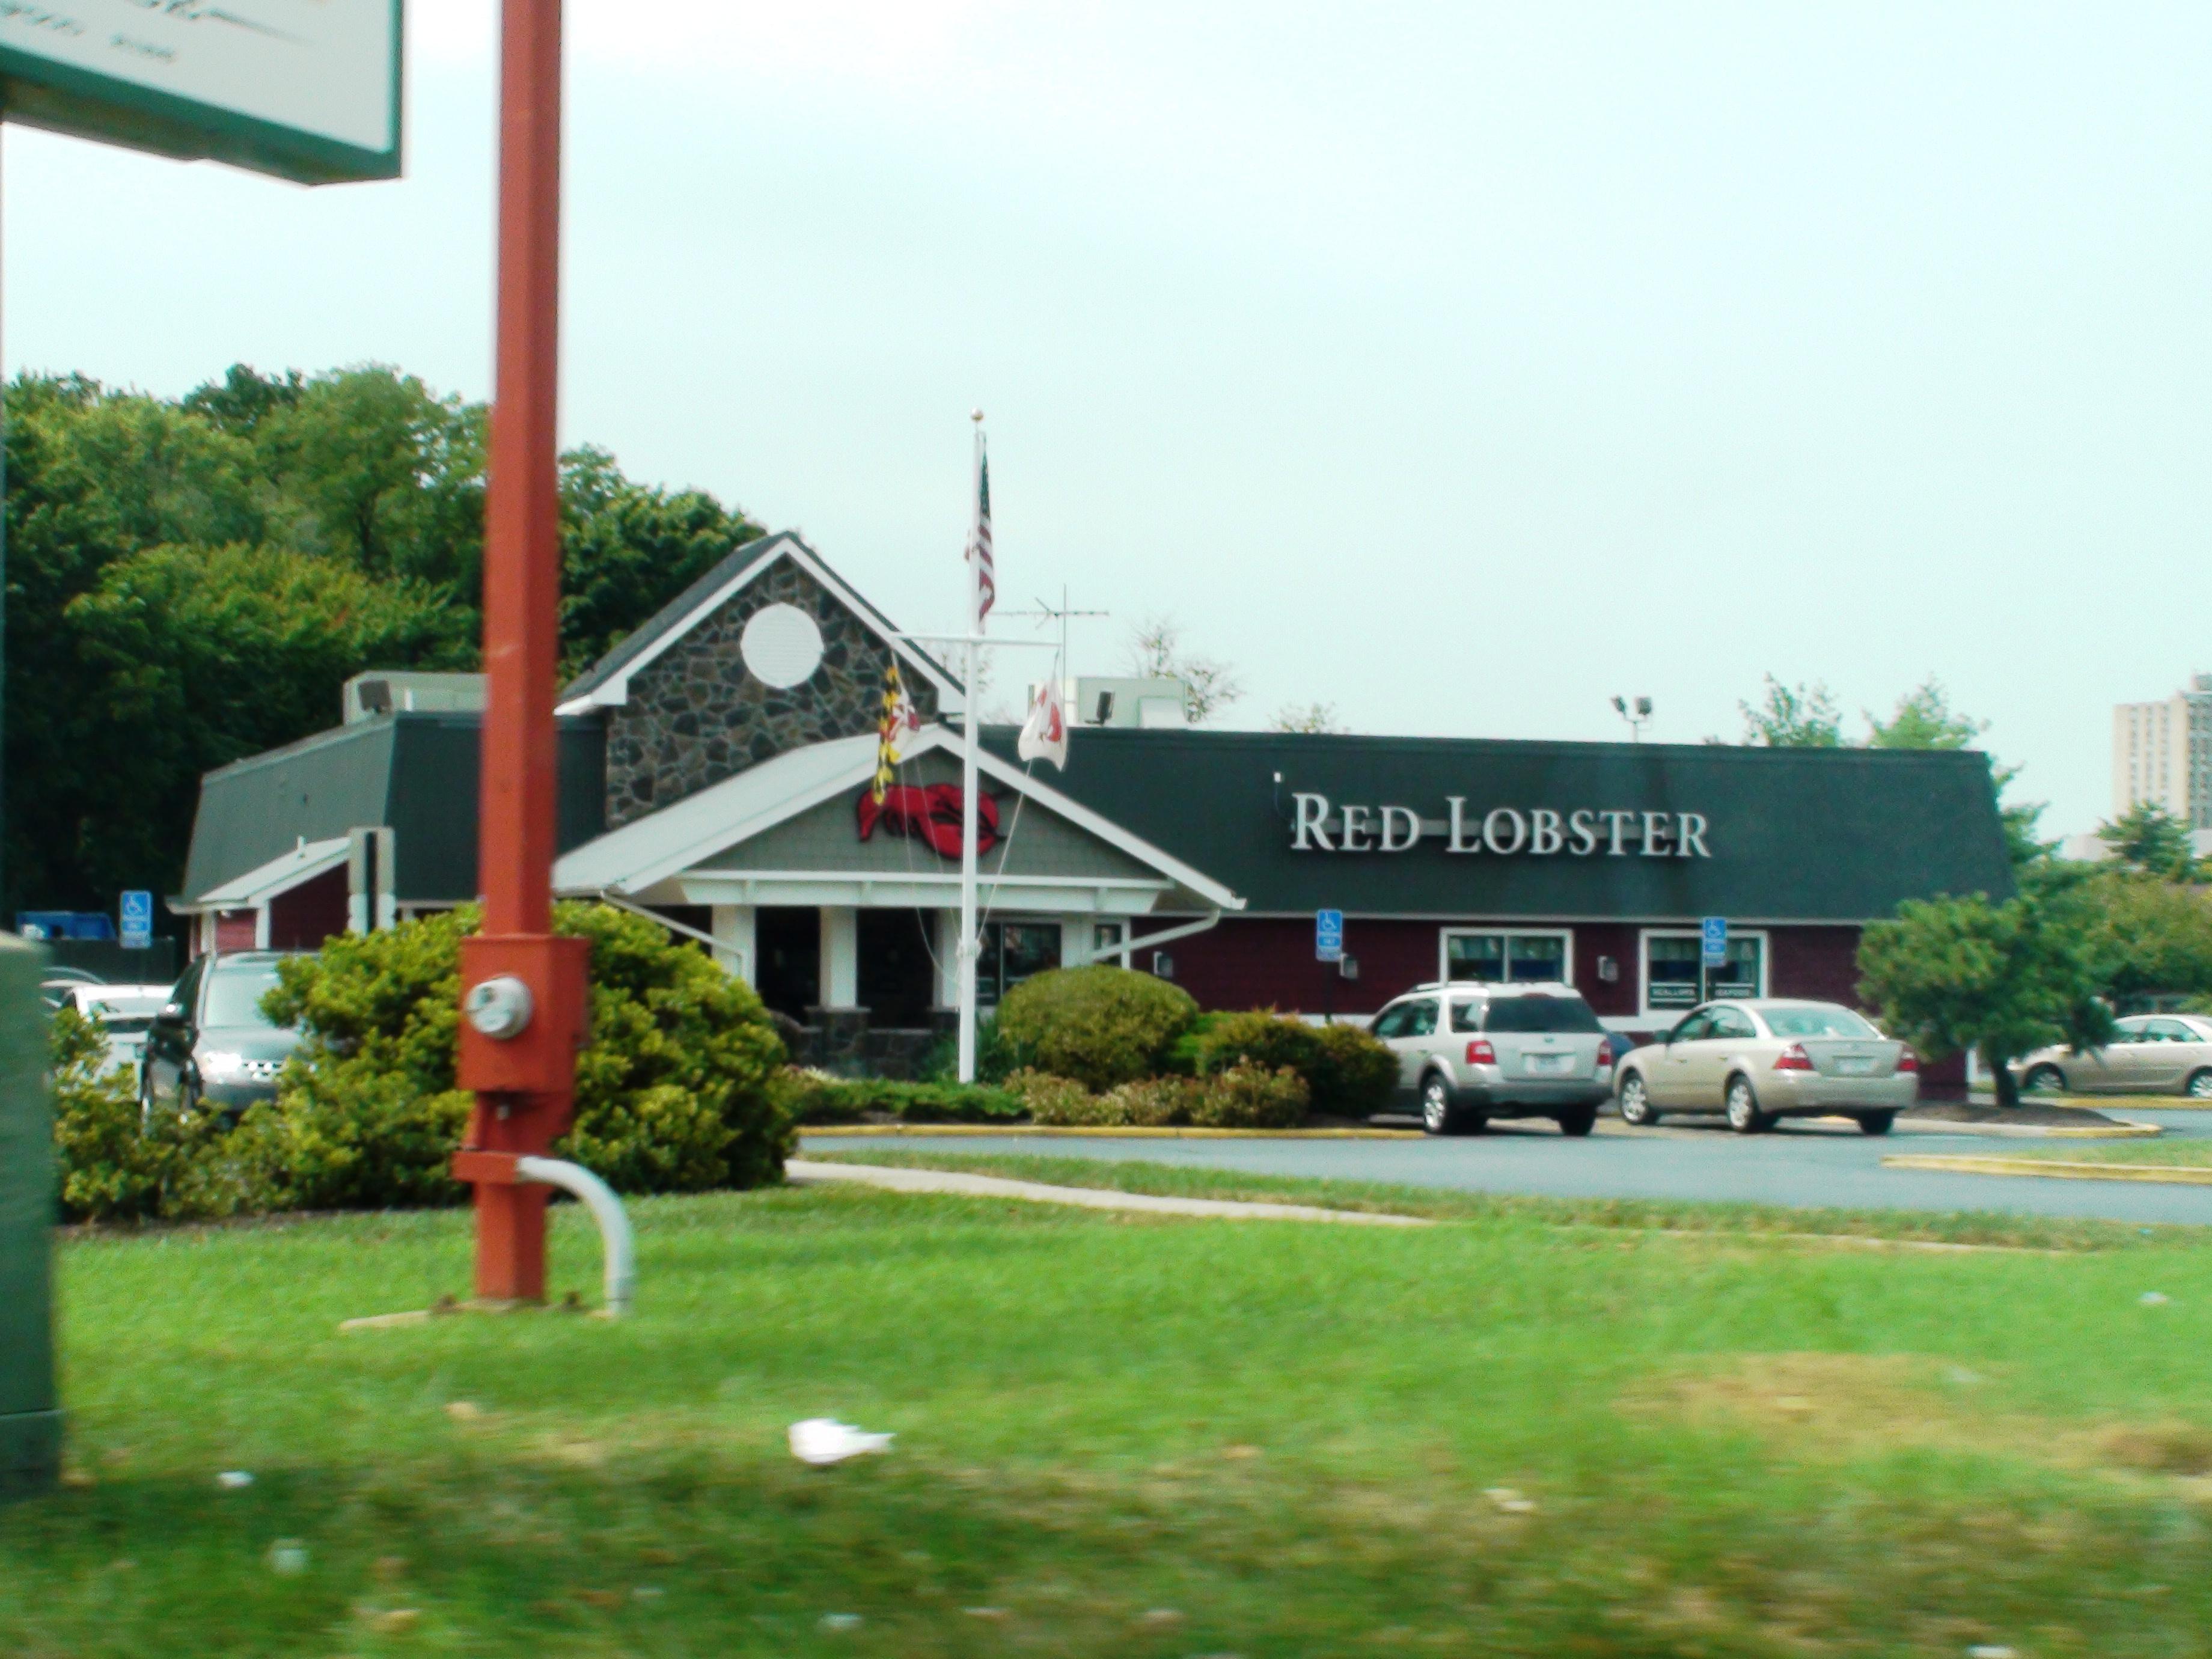 File:Red Lobster, Gaithersburg, Maryland, September 9, 2013.JPG - Wikimedia Commons